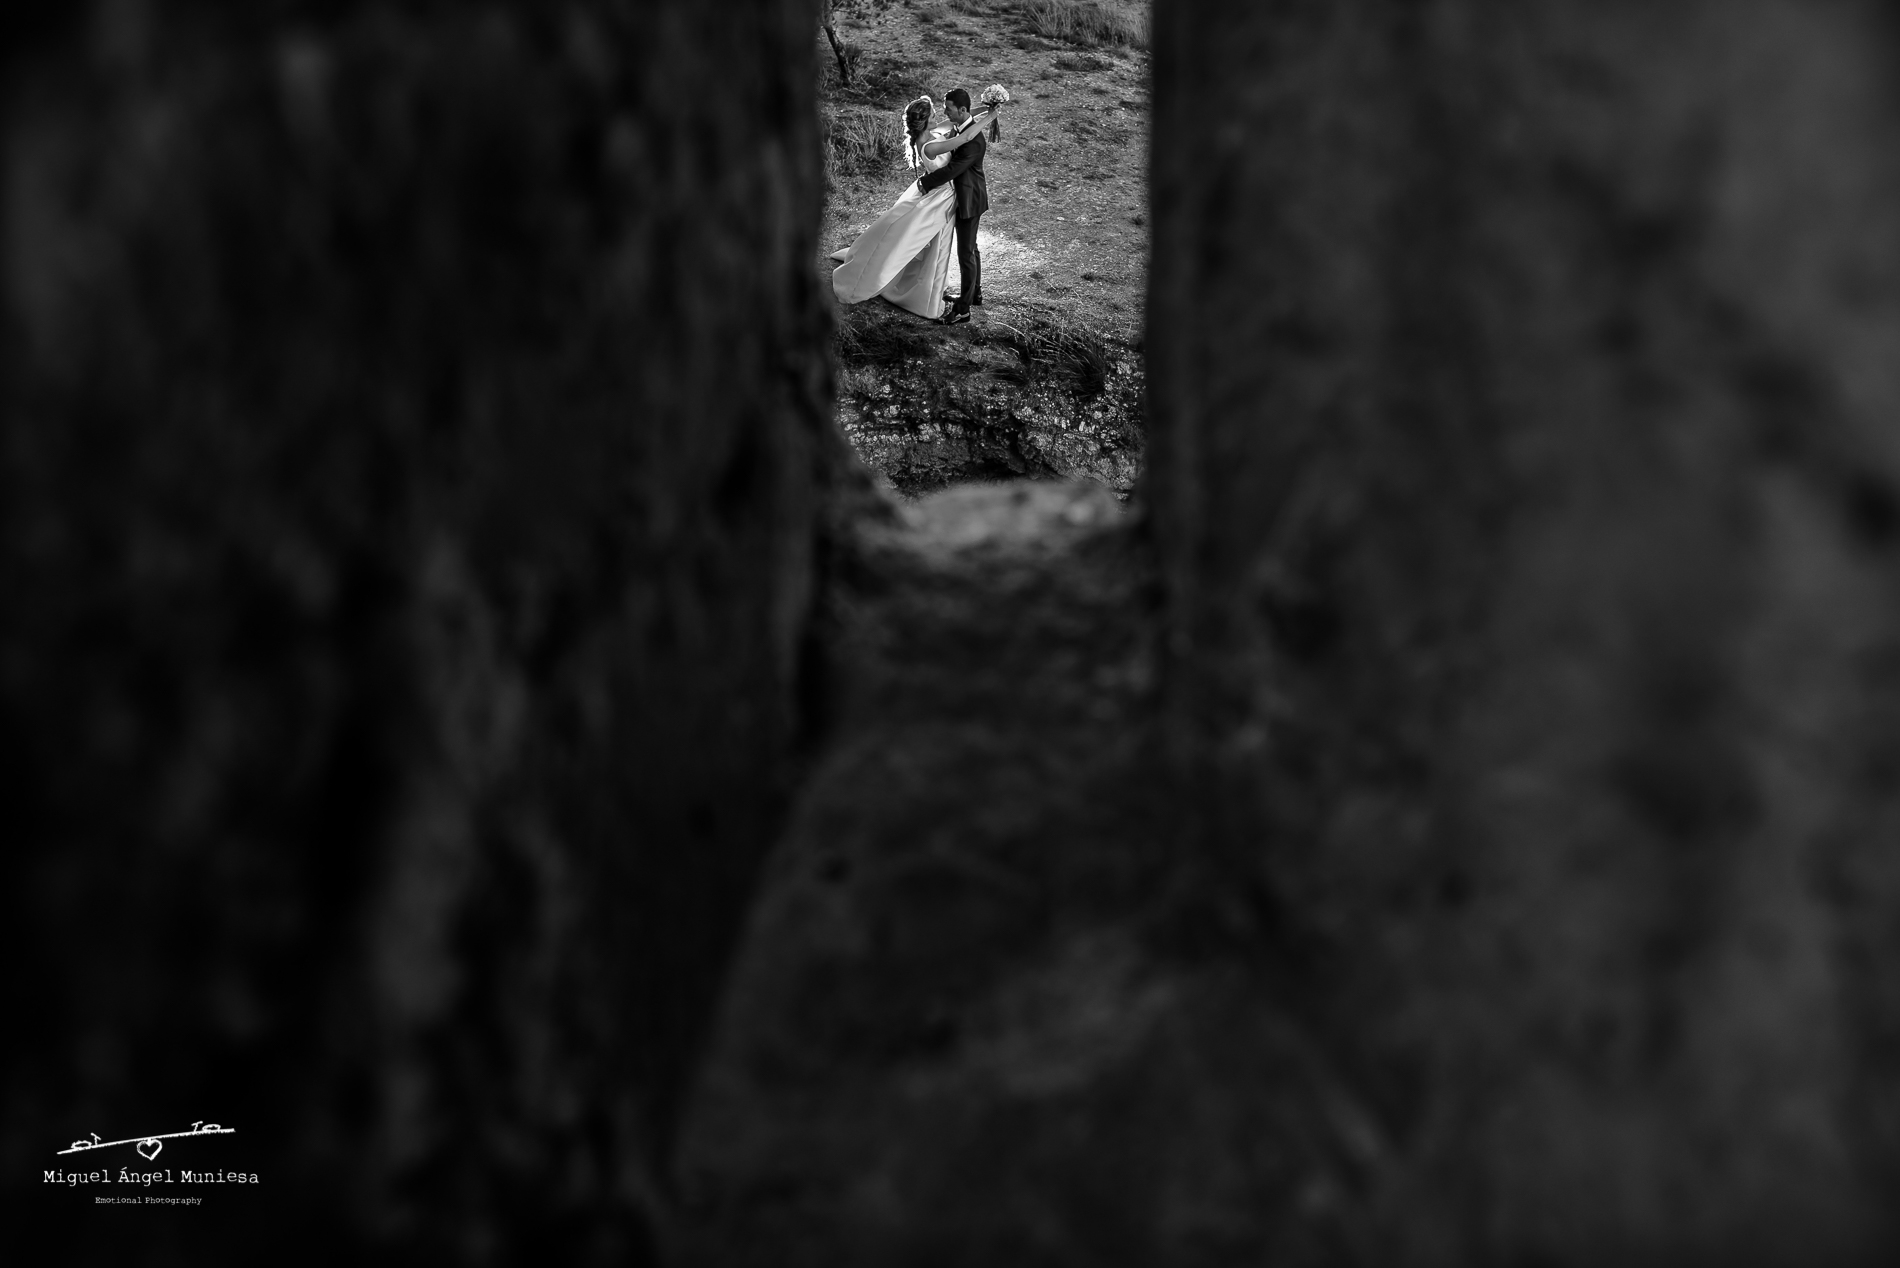 boda, fotografia de boda, boda zaragoza, fotografia, wedding, wedding photography, miguel angel muniesa, fotografo boda Zaragoza, fotografo boda, destination wedding_ 036